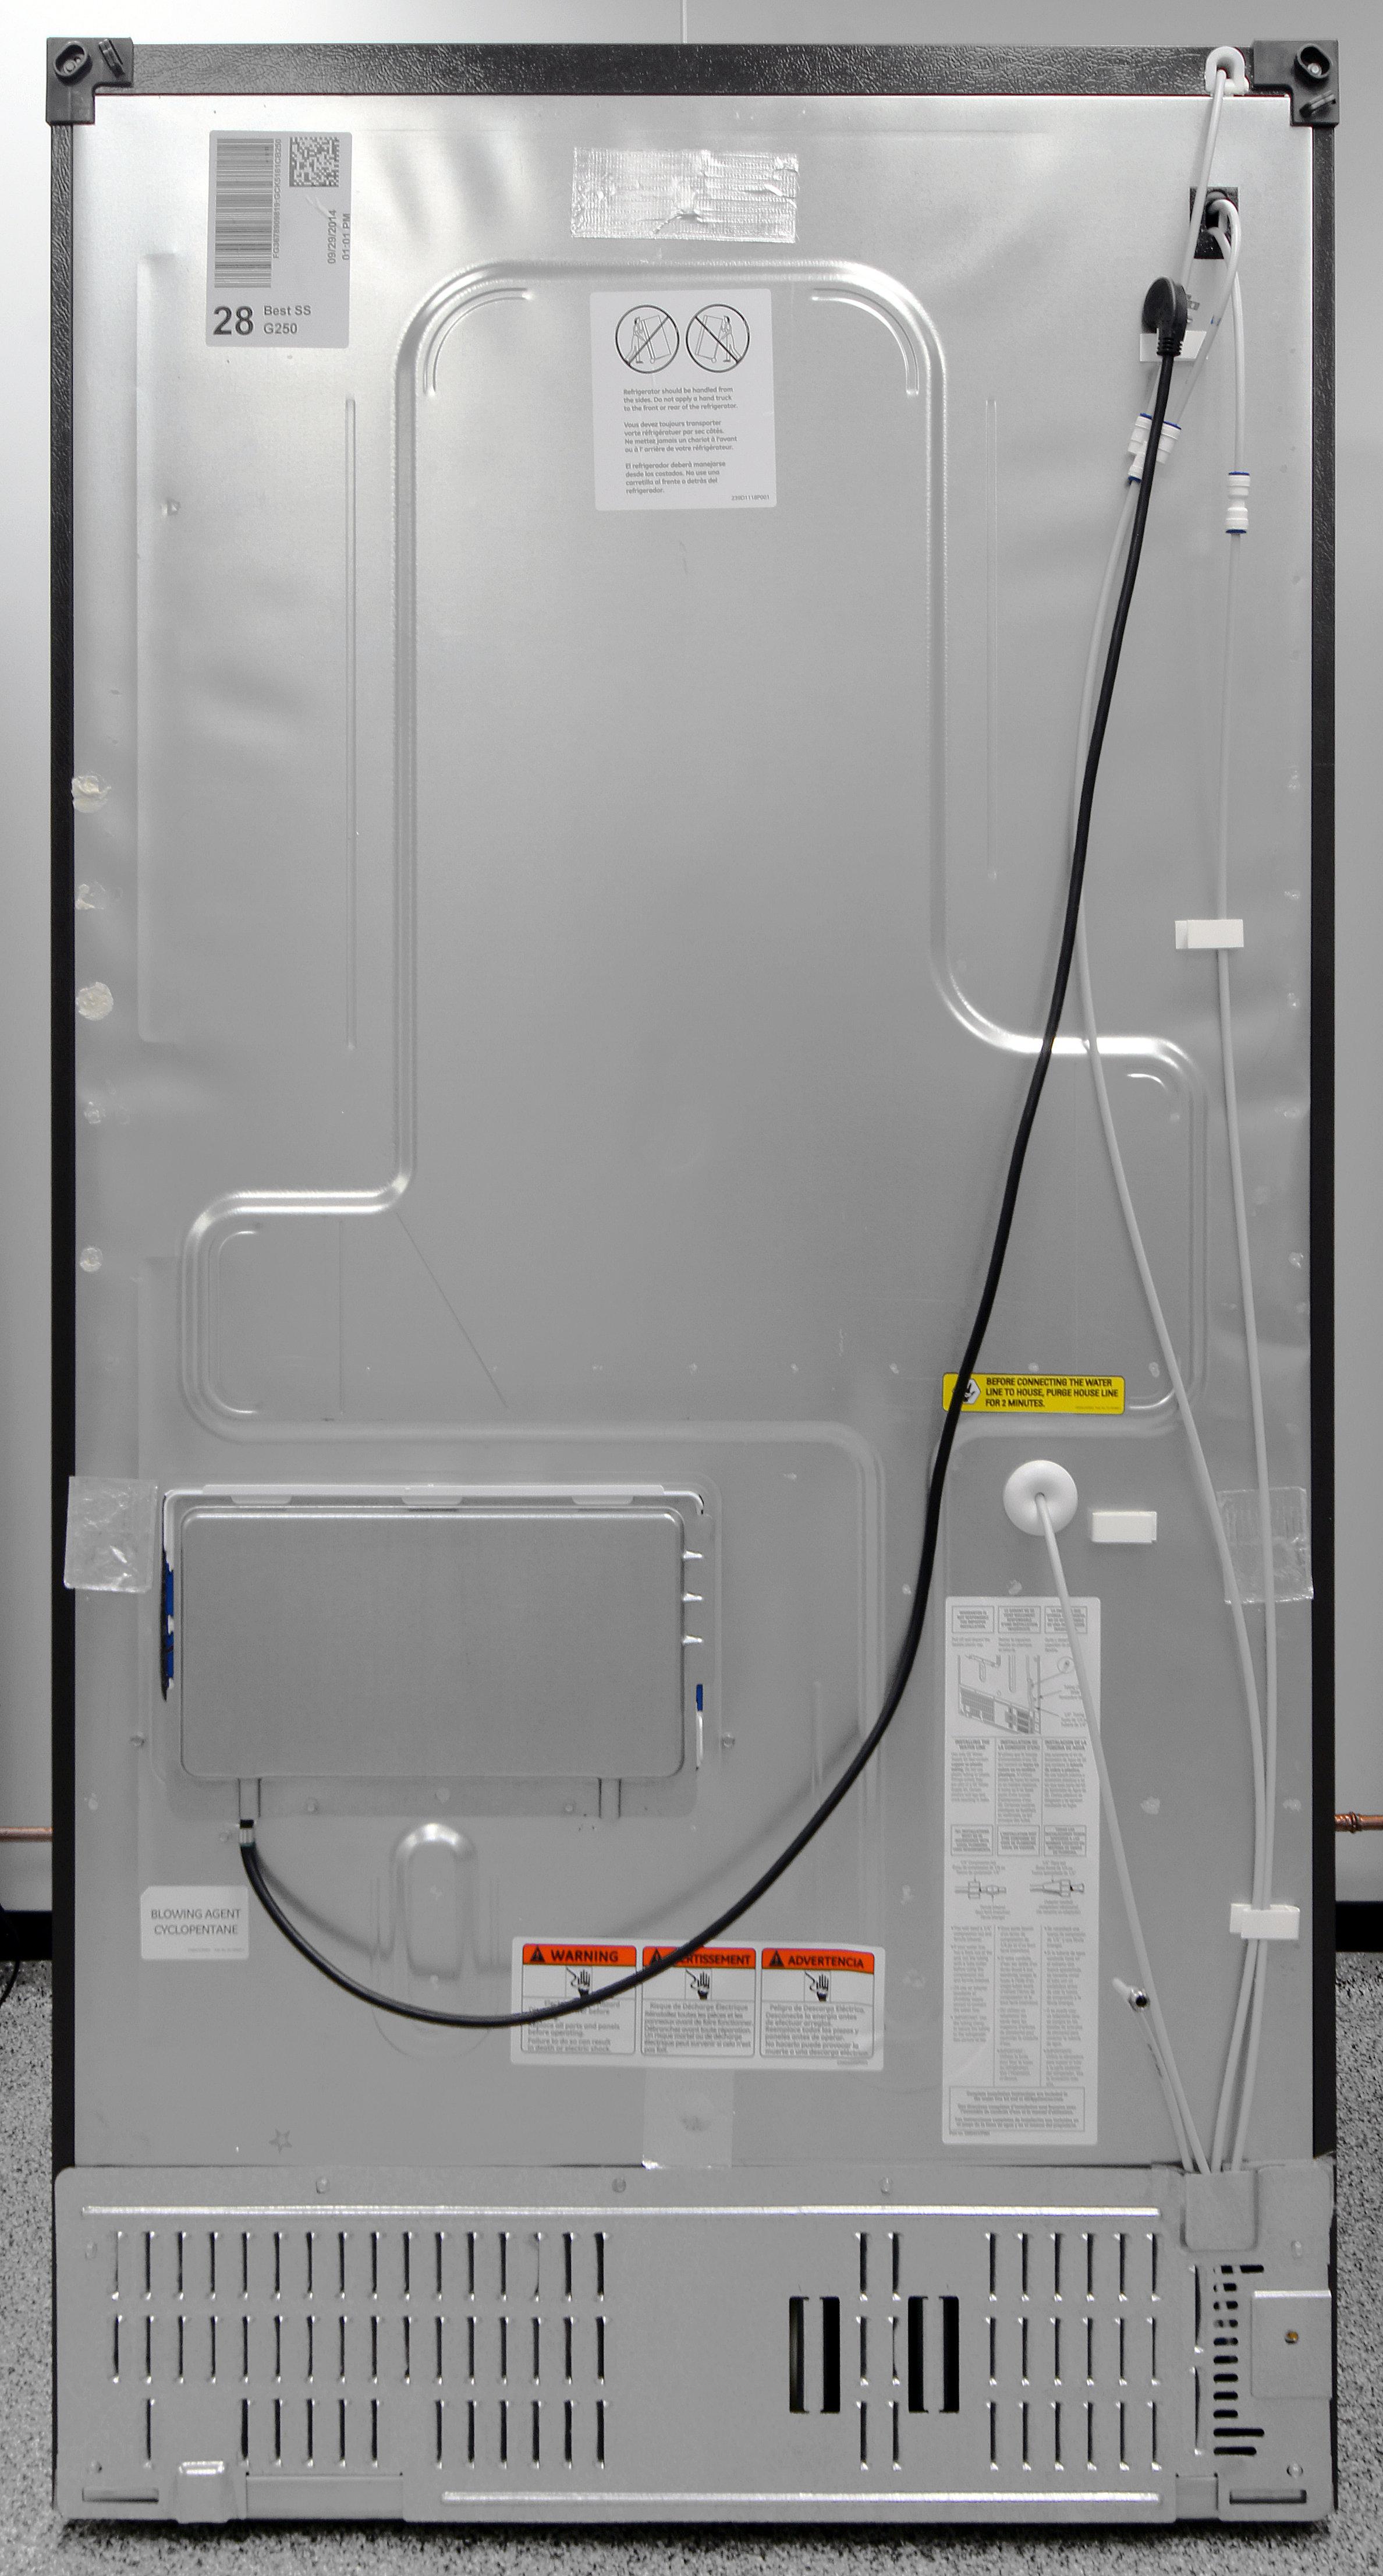 Ge profile refrigerator water line hookup